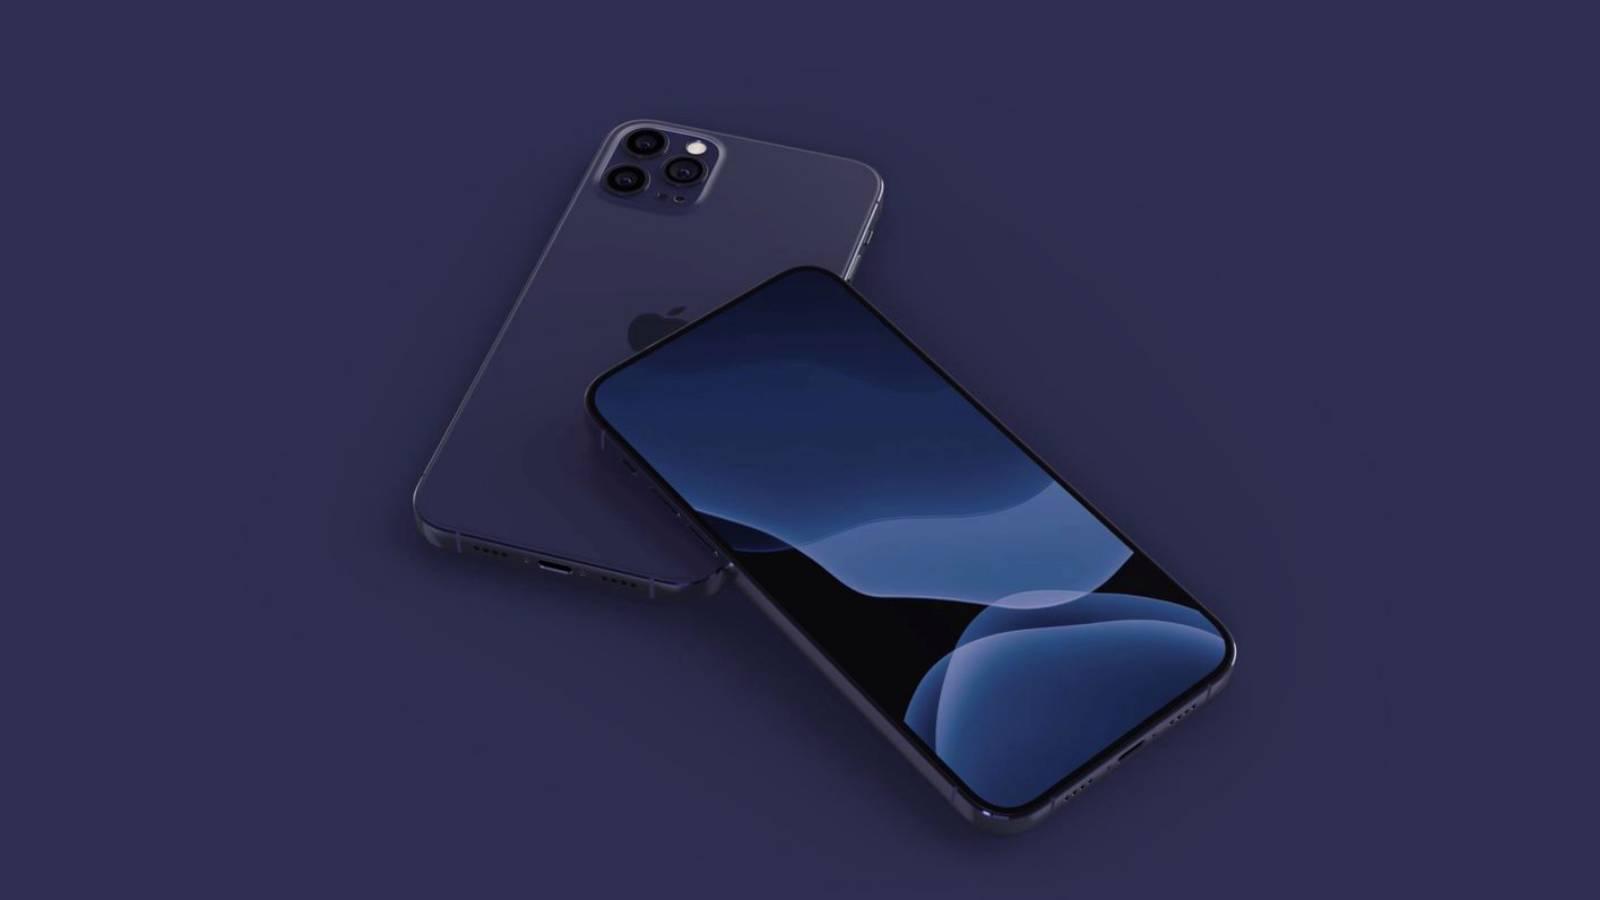 iphone 12 5.4 inch ios 14